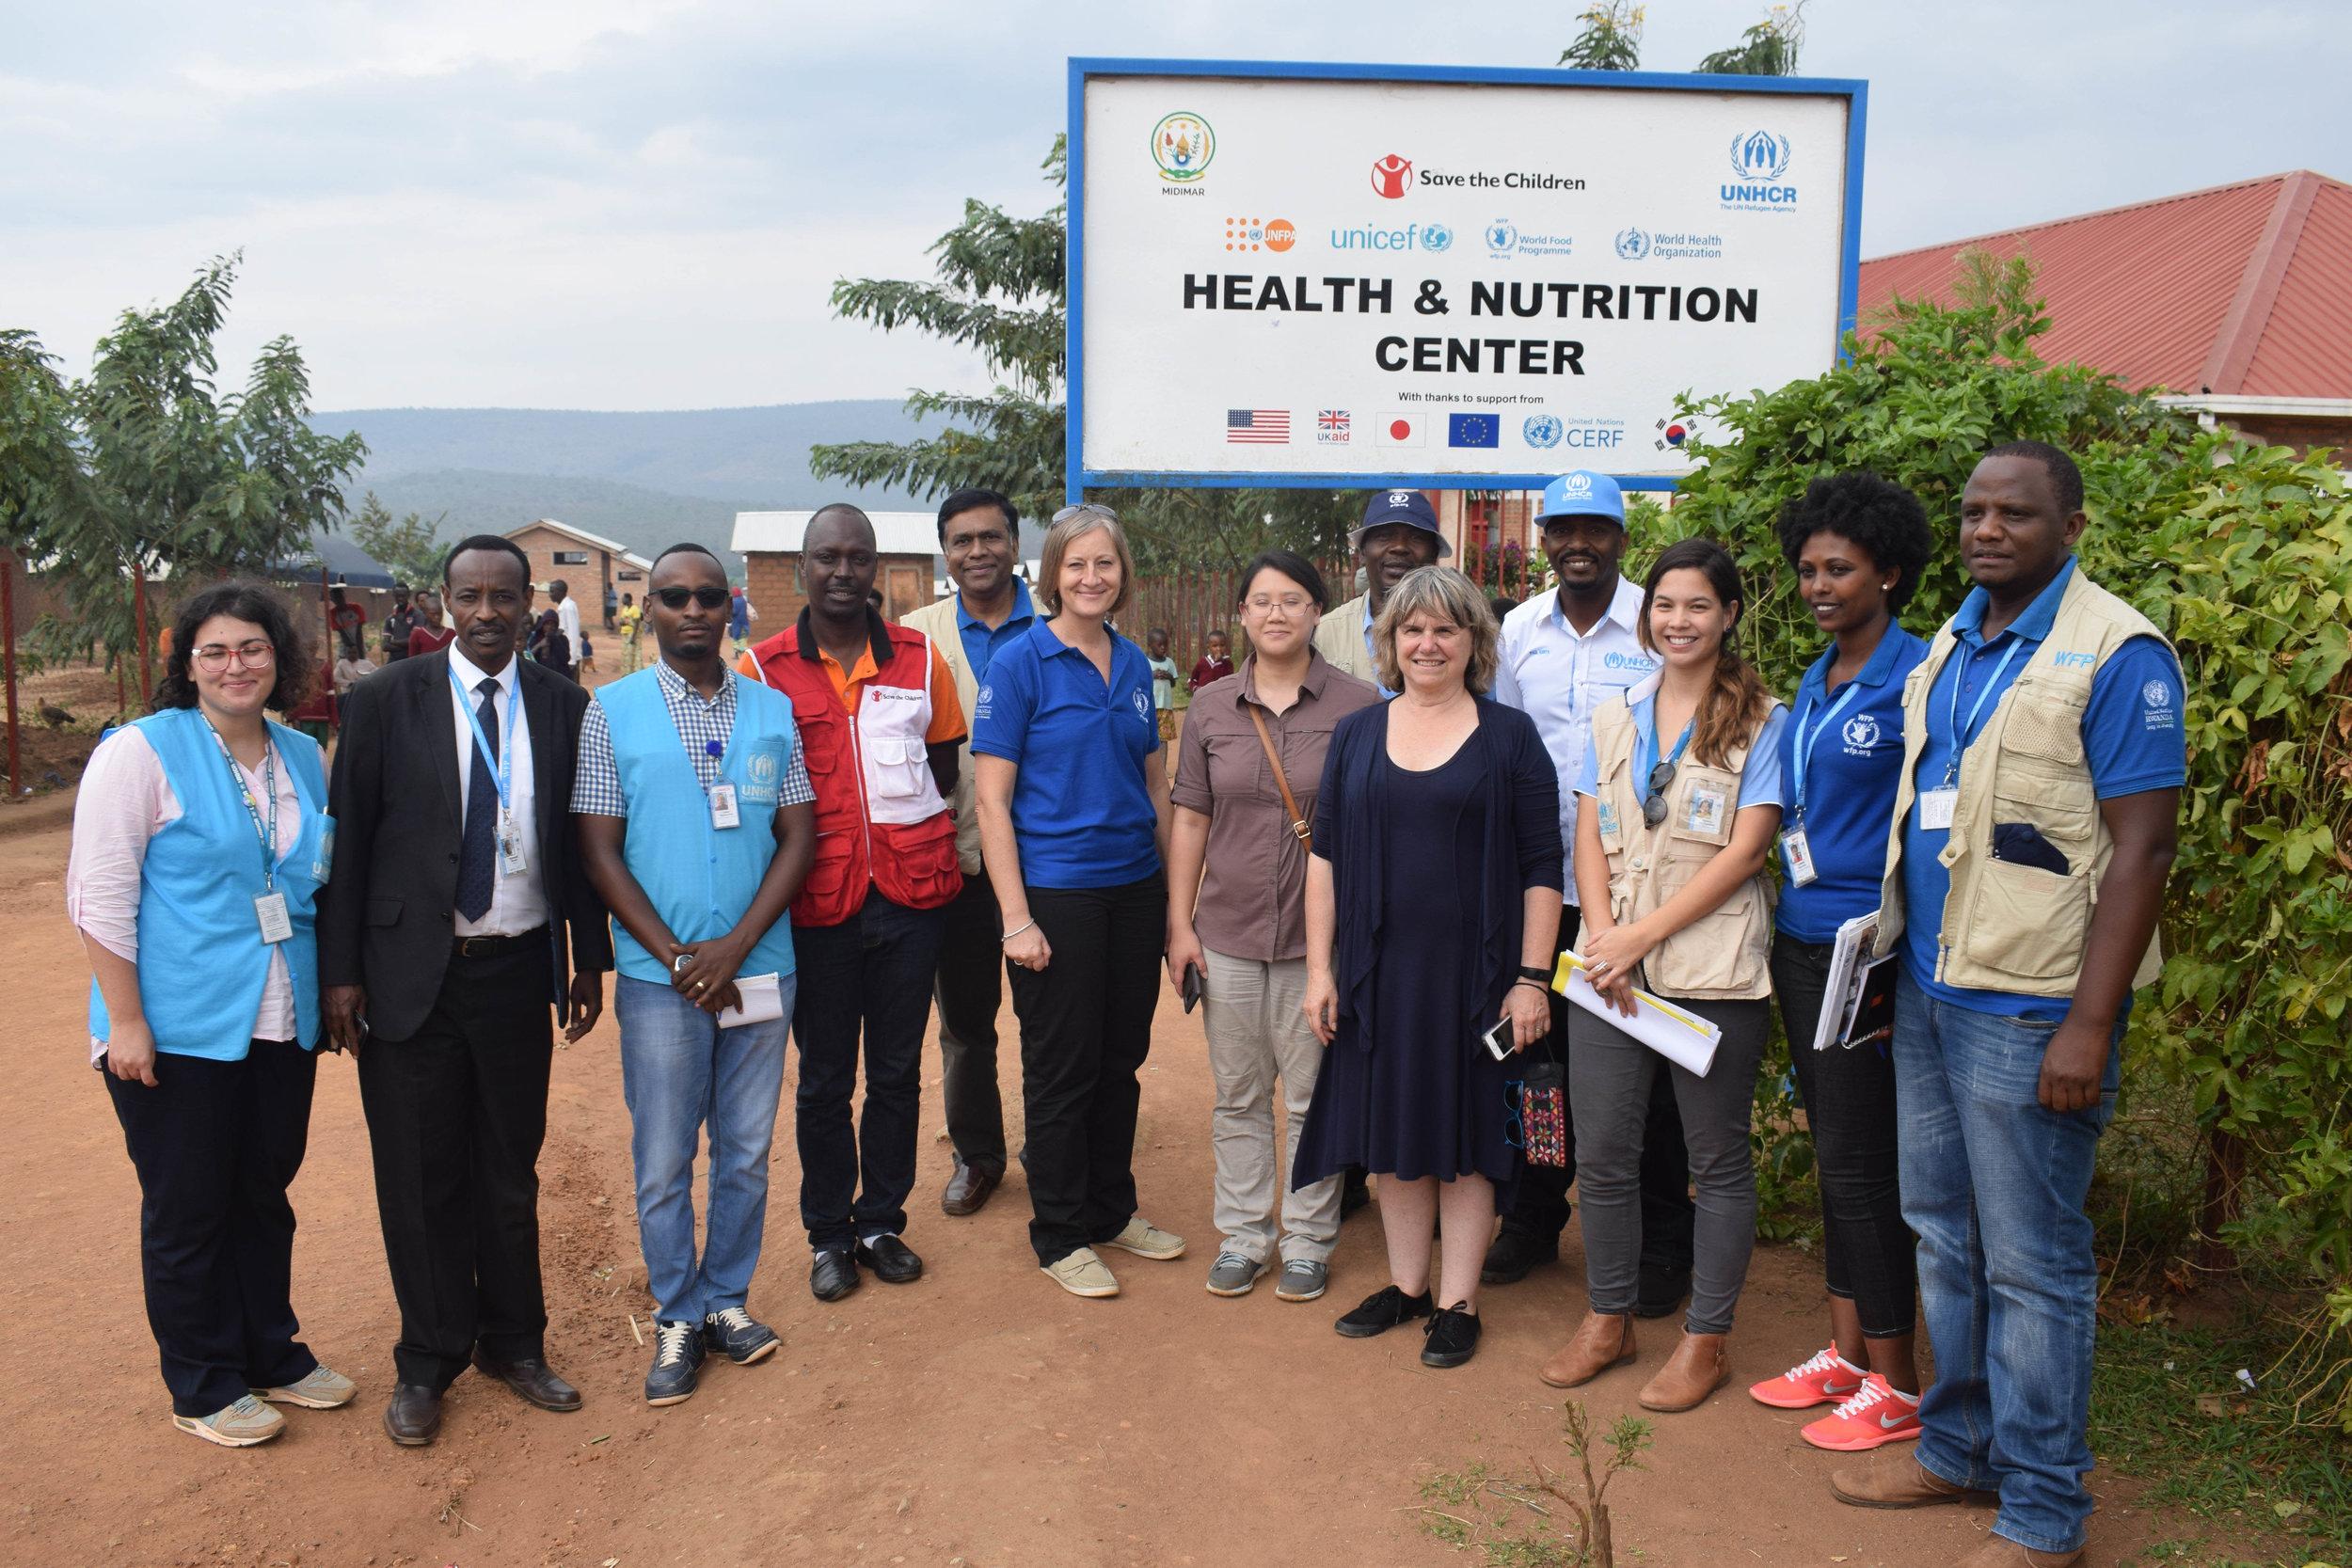 Mahama Refugee Camp, Rwanda 2018 (Photo by Edith Heines)